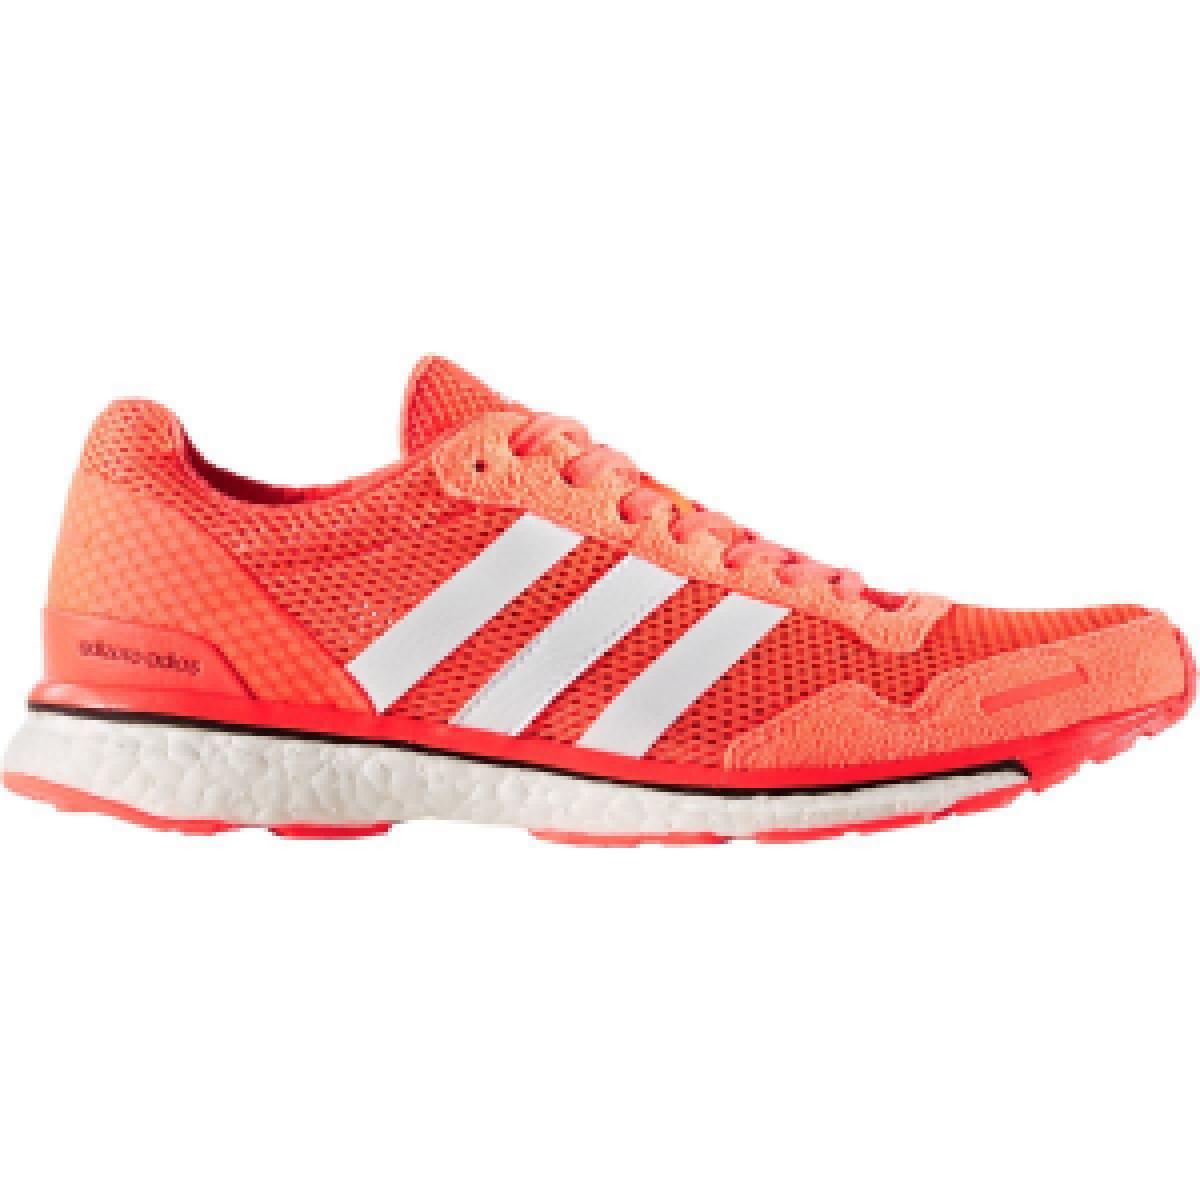 pretty nice 1a12e 0b963 Adidas Adizero Adios Boost 3 Running Shoe - Men's